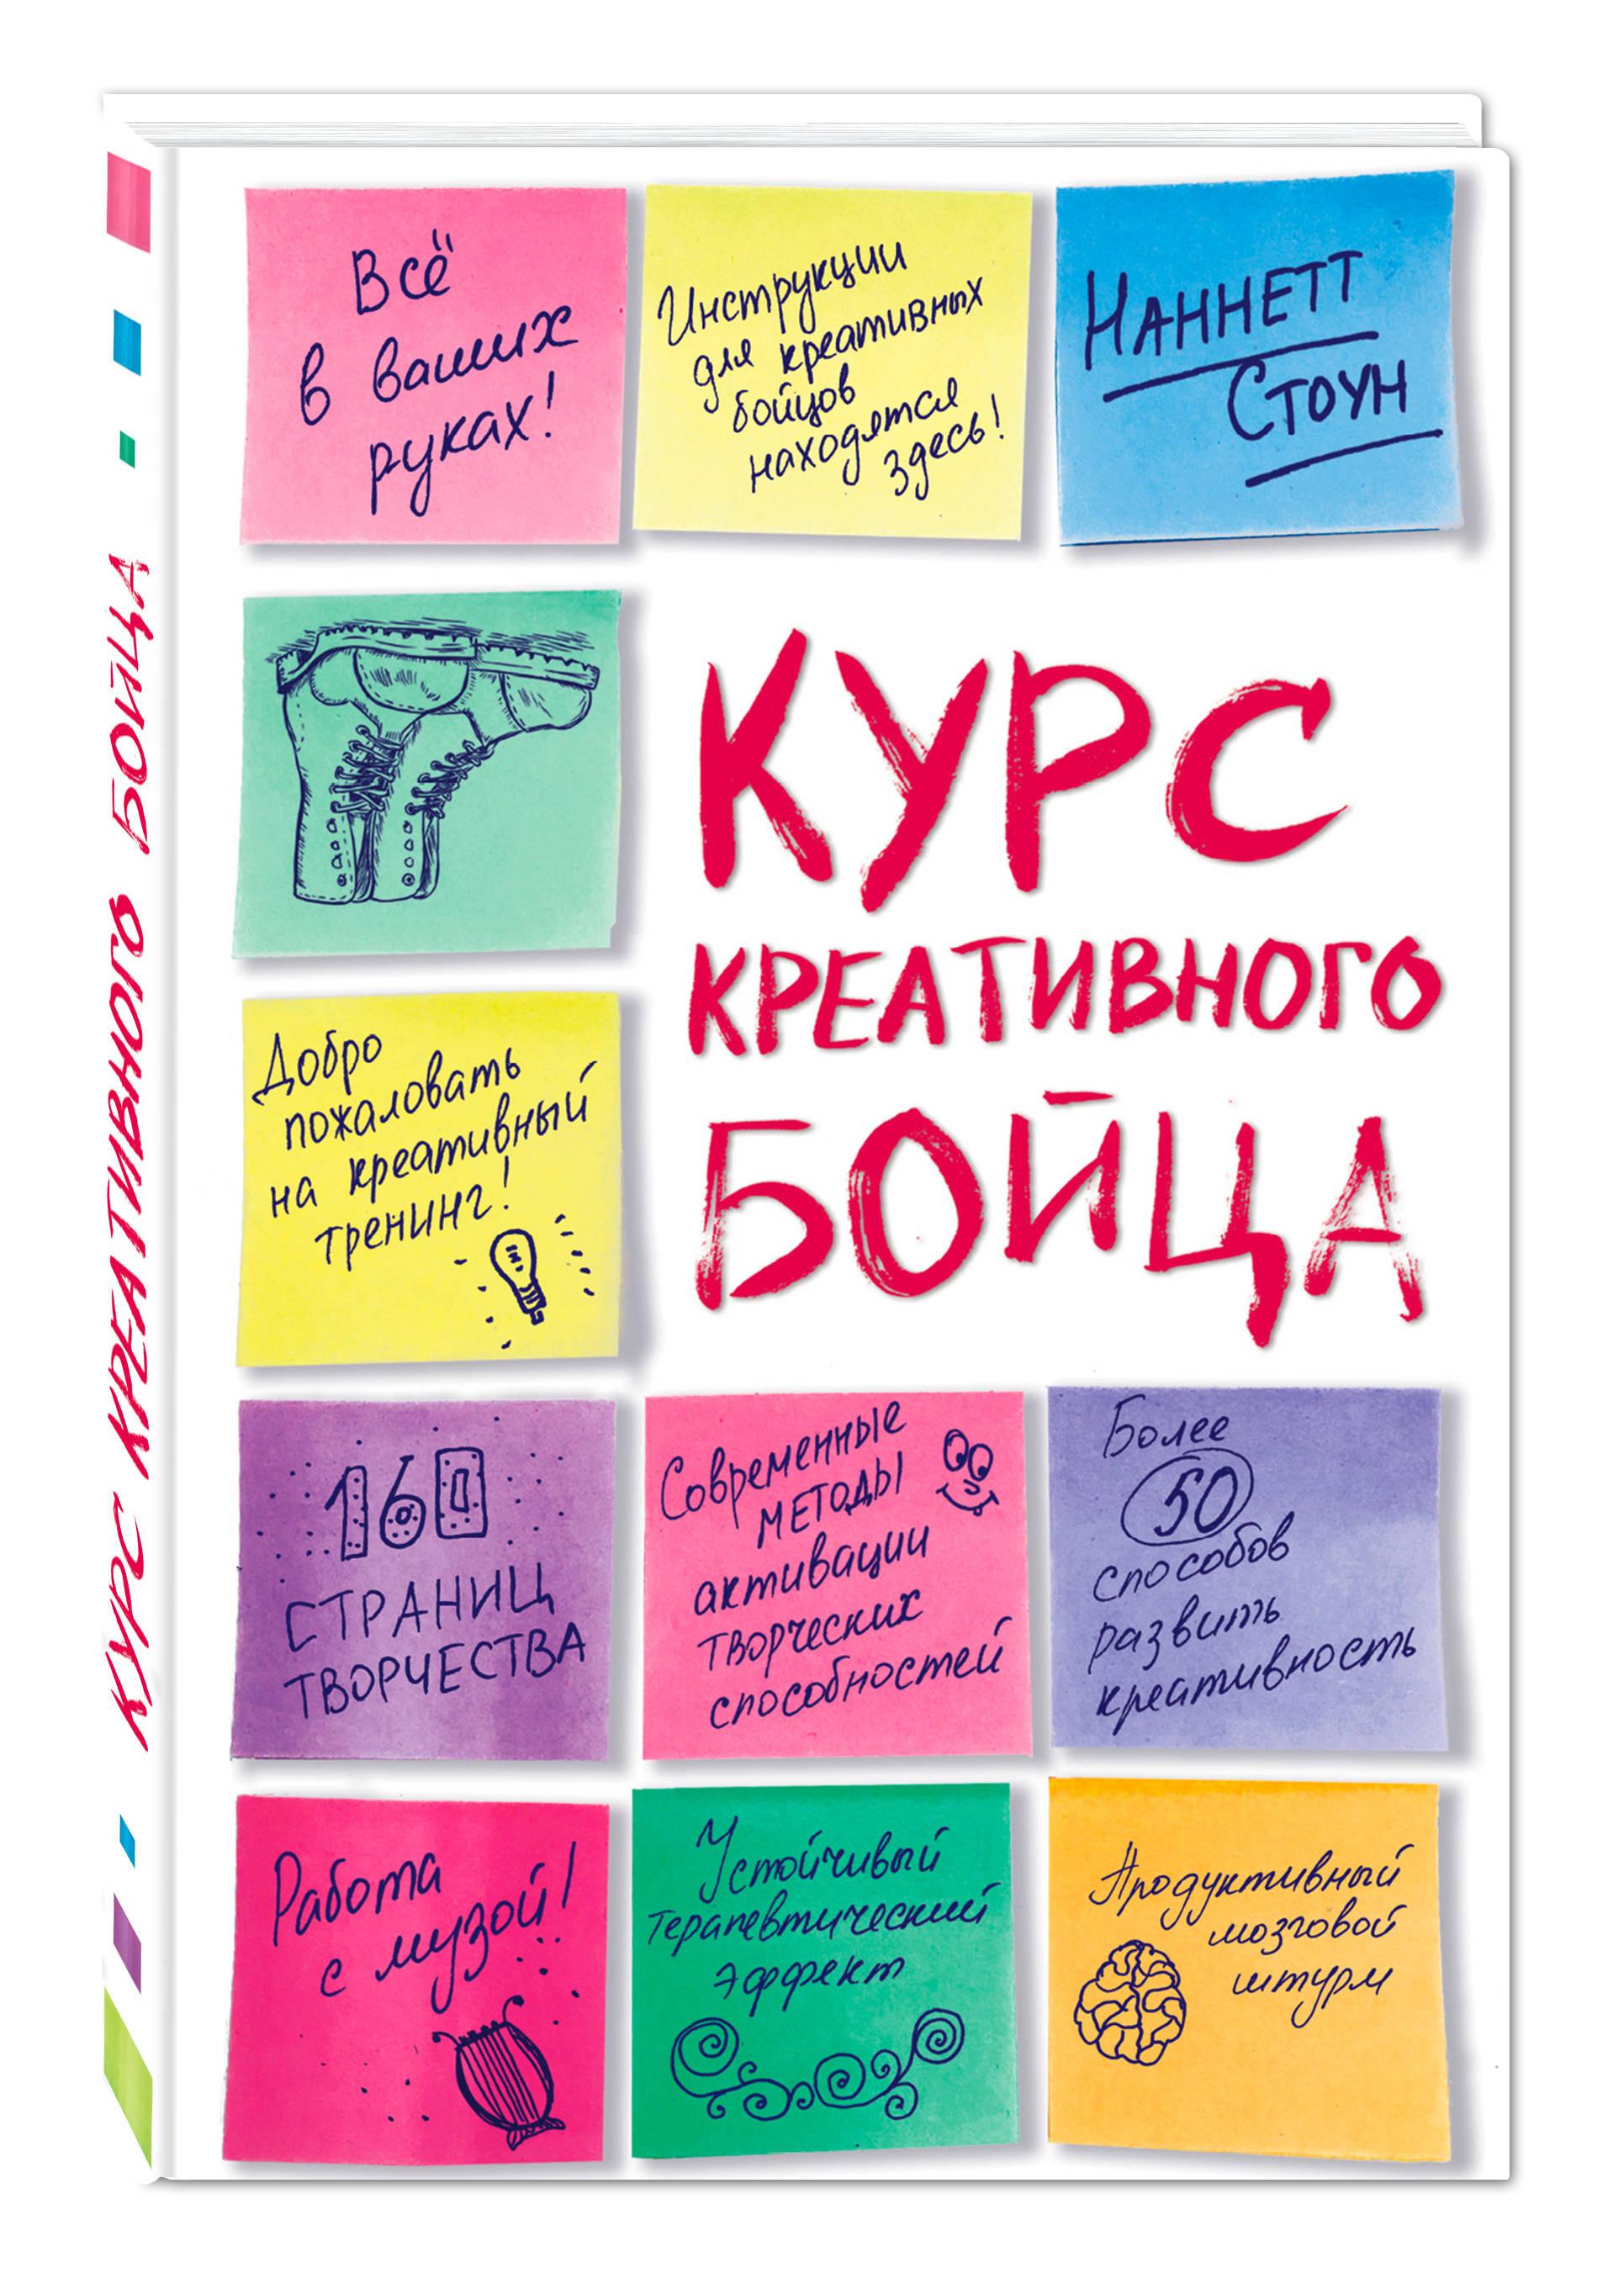 Курс креативного бойца книги эксмо курс креативного бойца